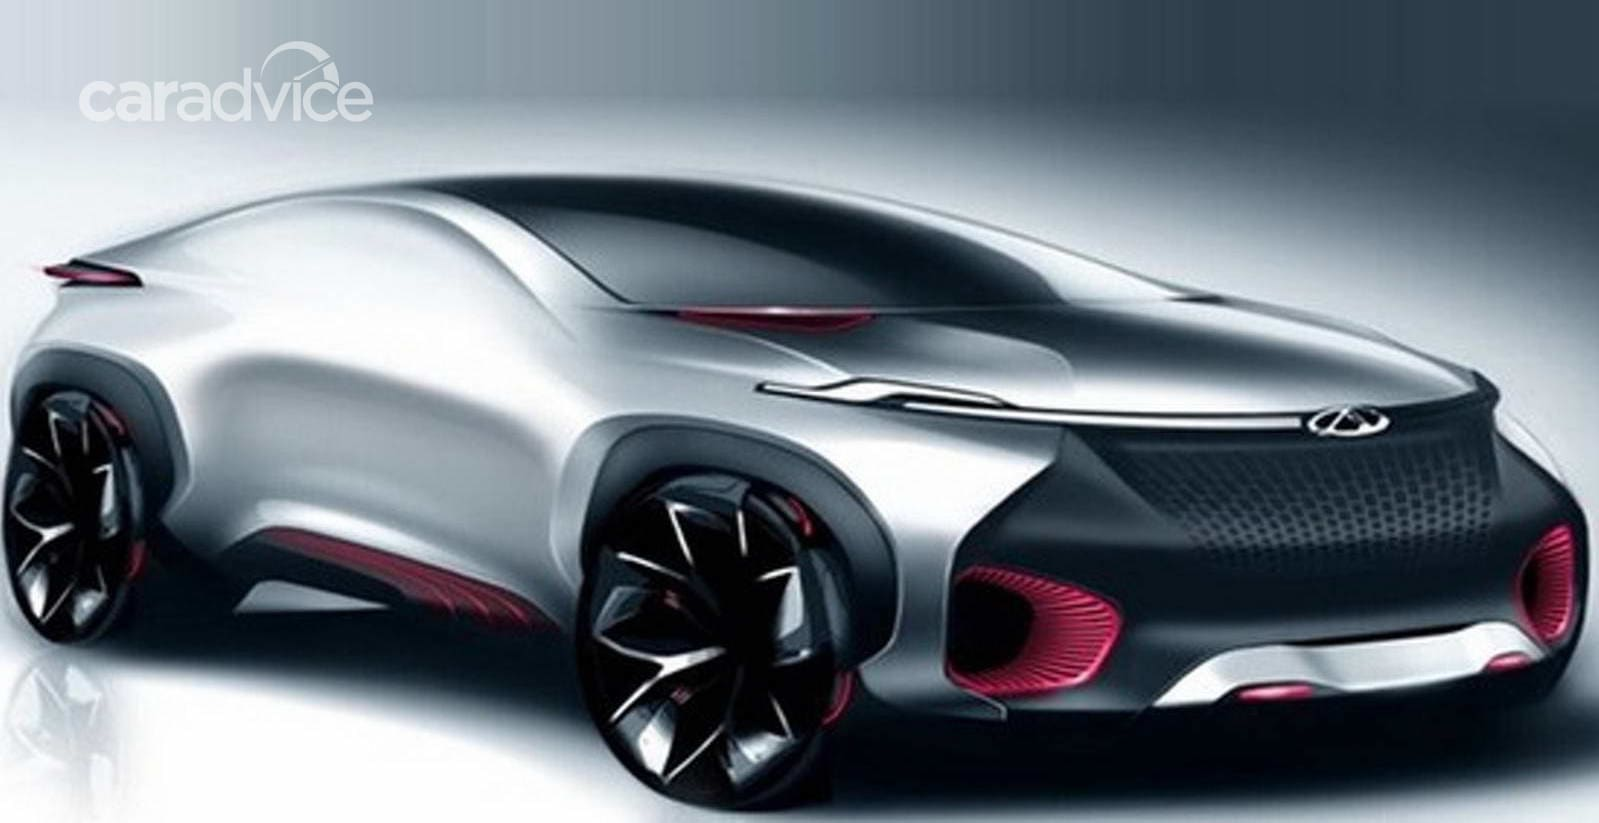 Chery FV2030 Concept side profile at Auto China 2016